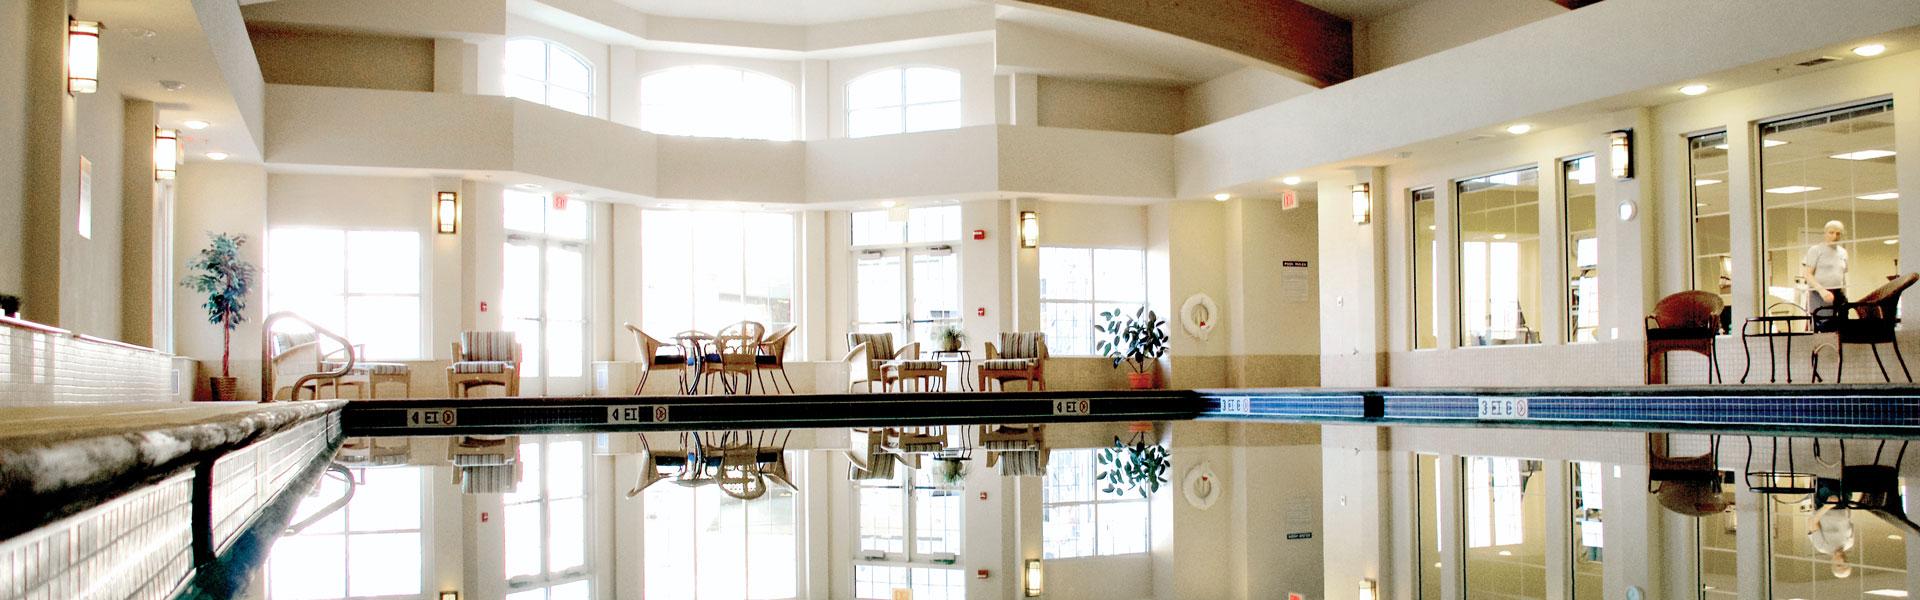 Indoor Pool at StoneRidge Senior Independent Living